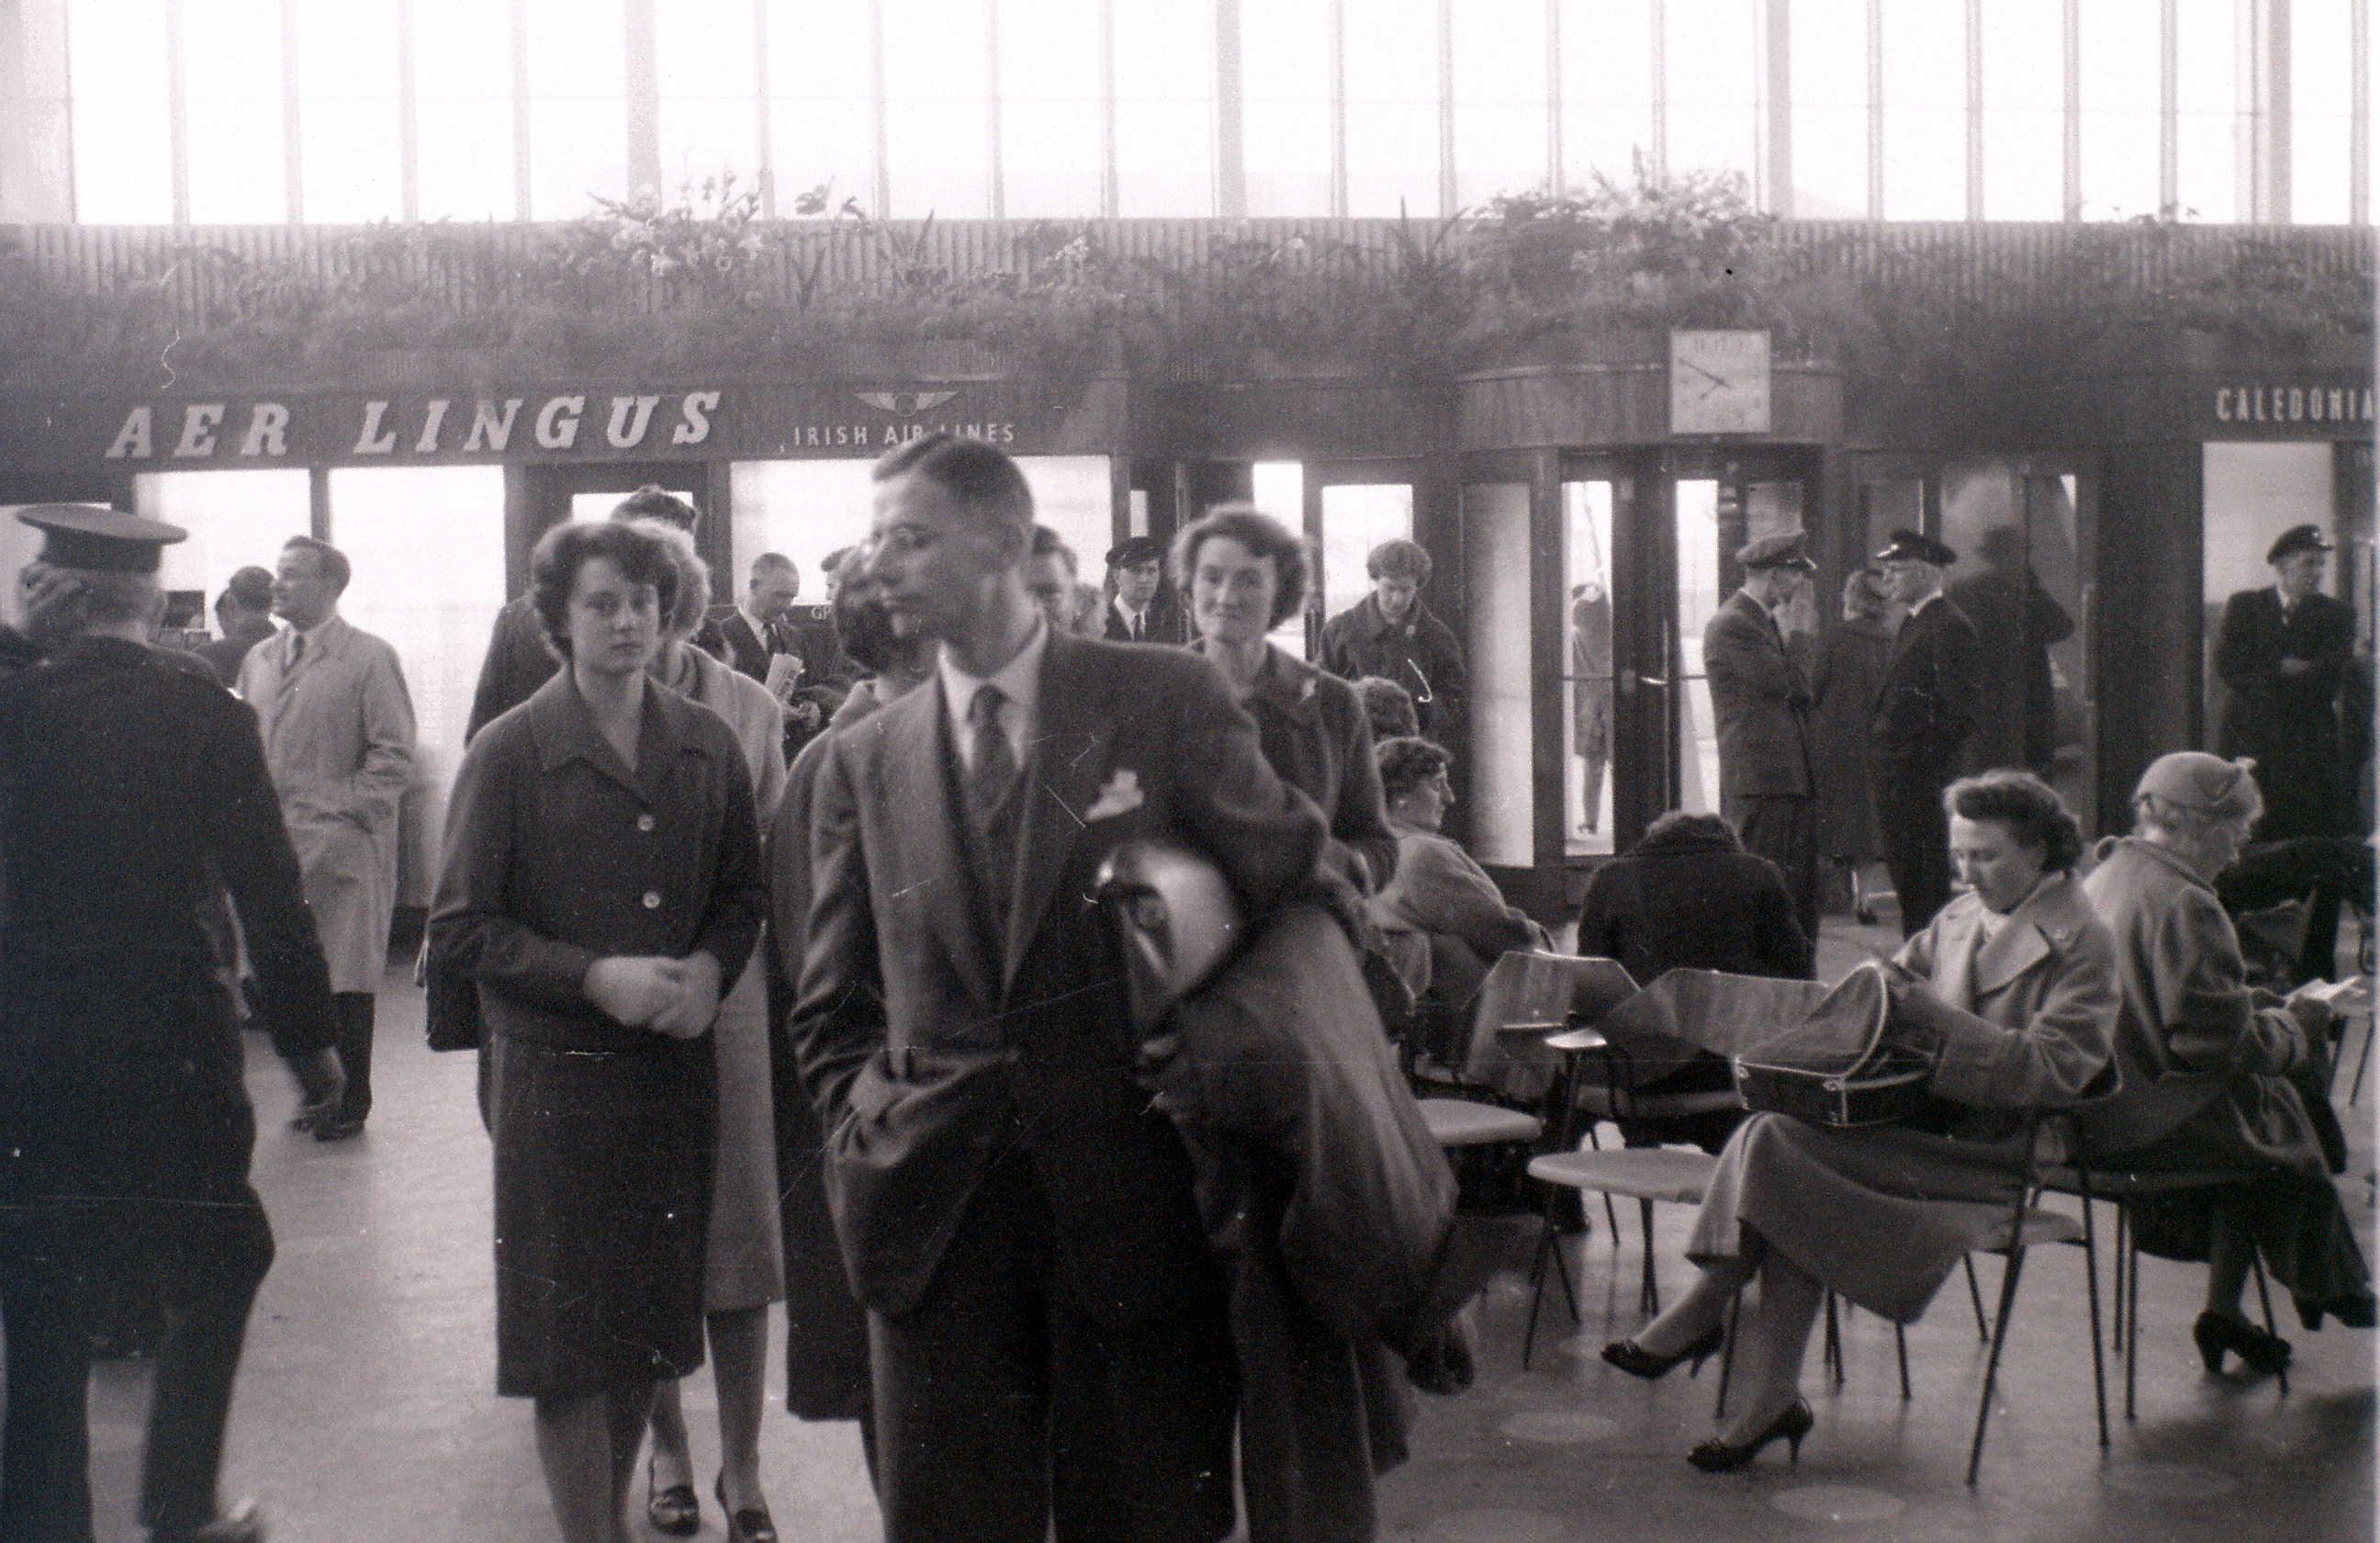 Глазго, 19 апреля 1960. Международный аэропорт Глазго.jpg